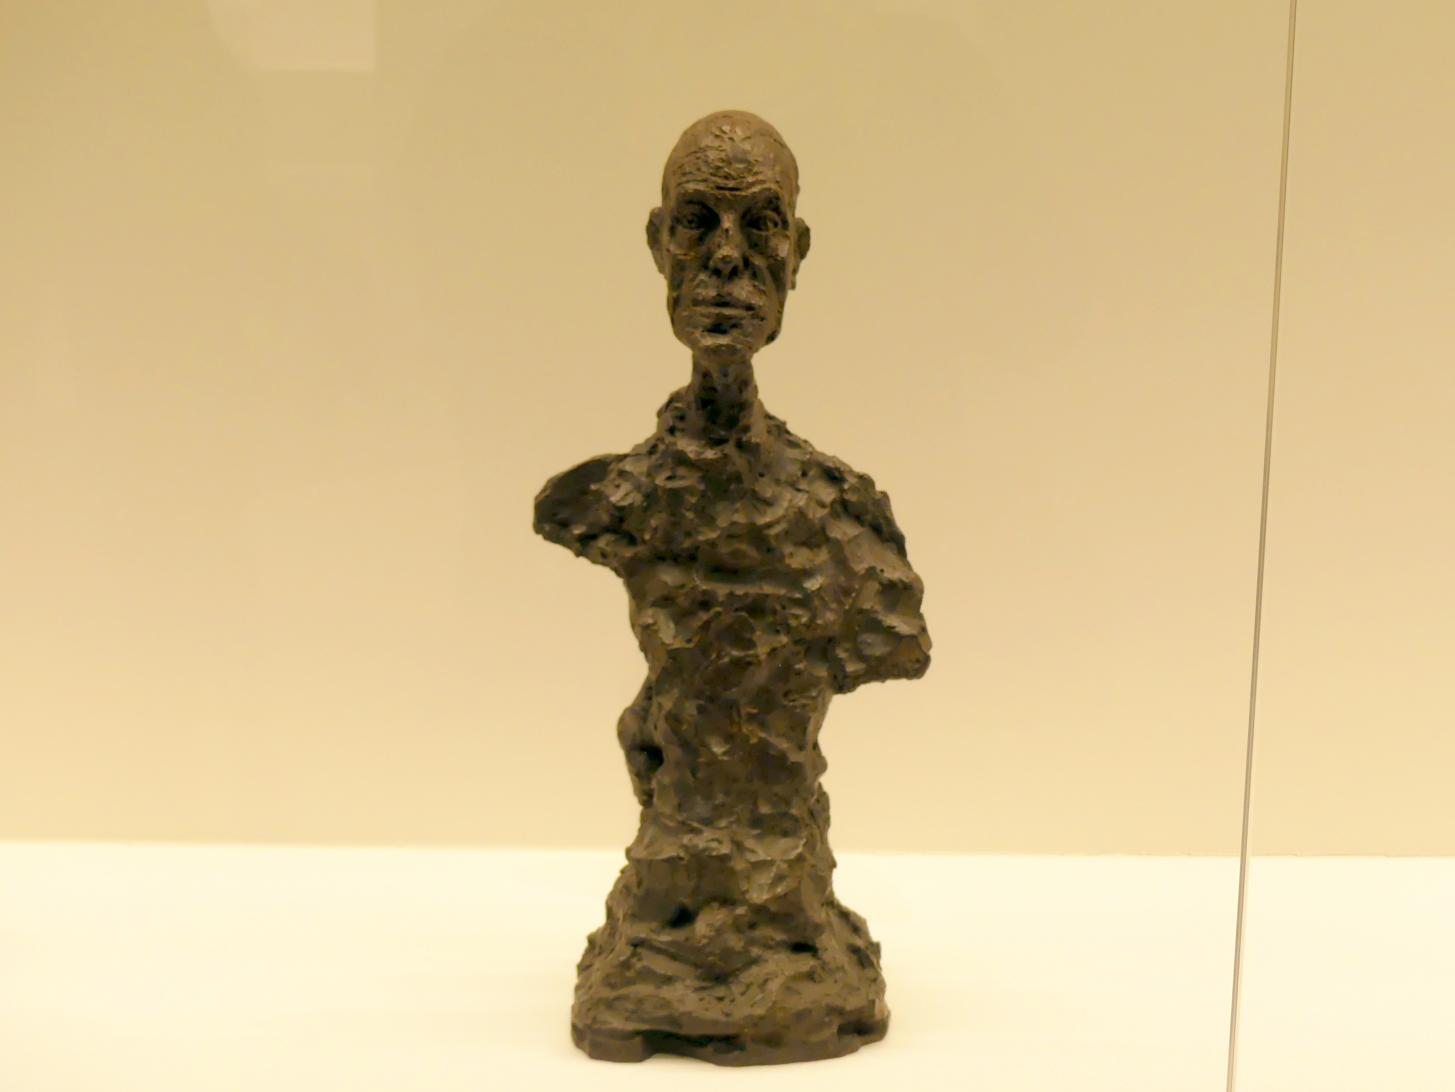 Alberto Giacometti: Büste von Diego, 1964